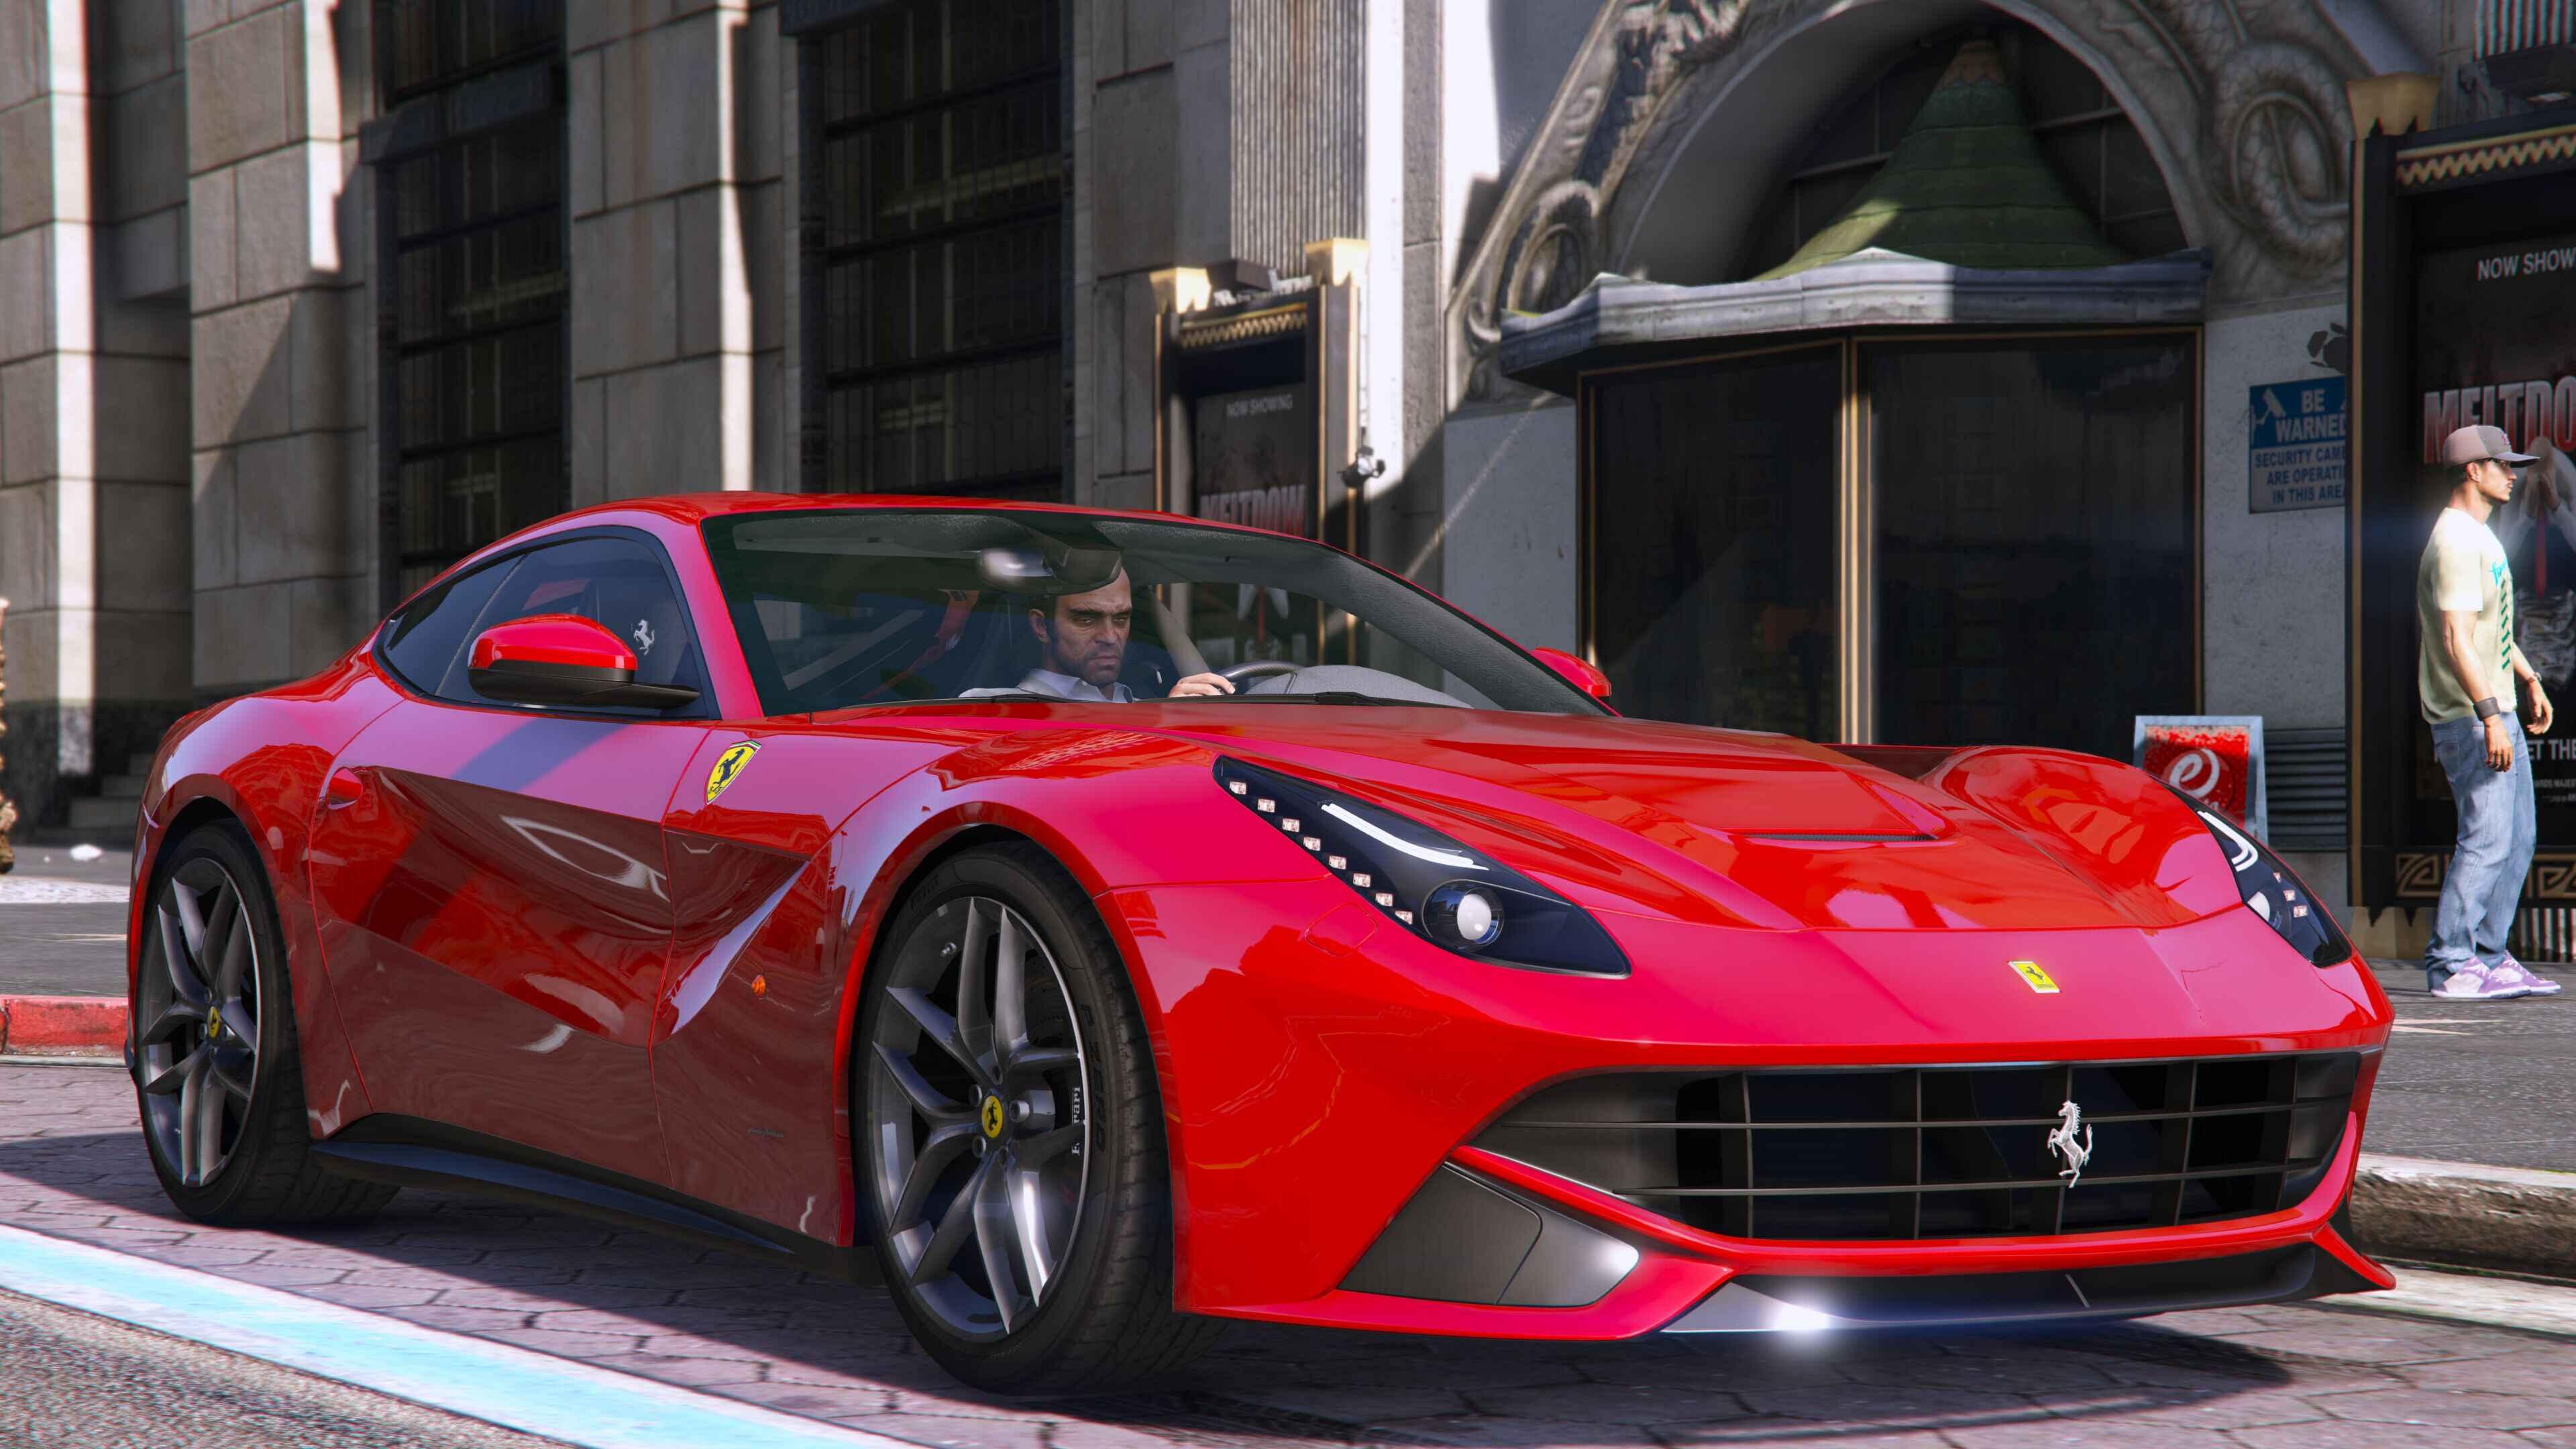 2013 Ferrari F12 Berlinetta Gta Mods Zone